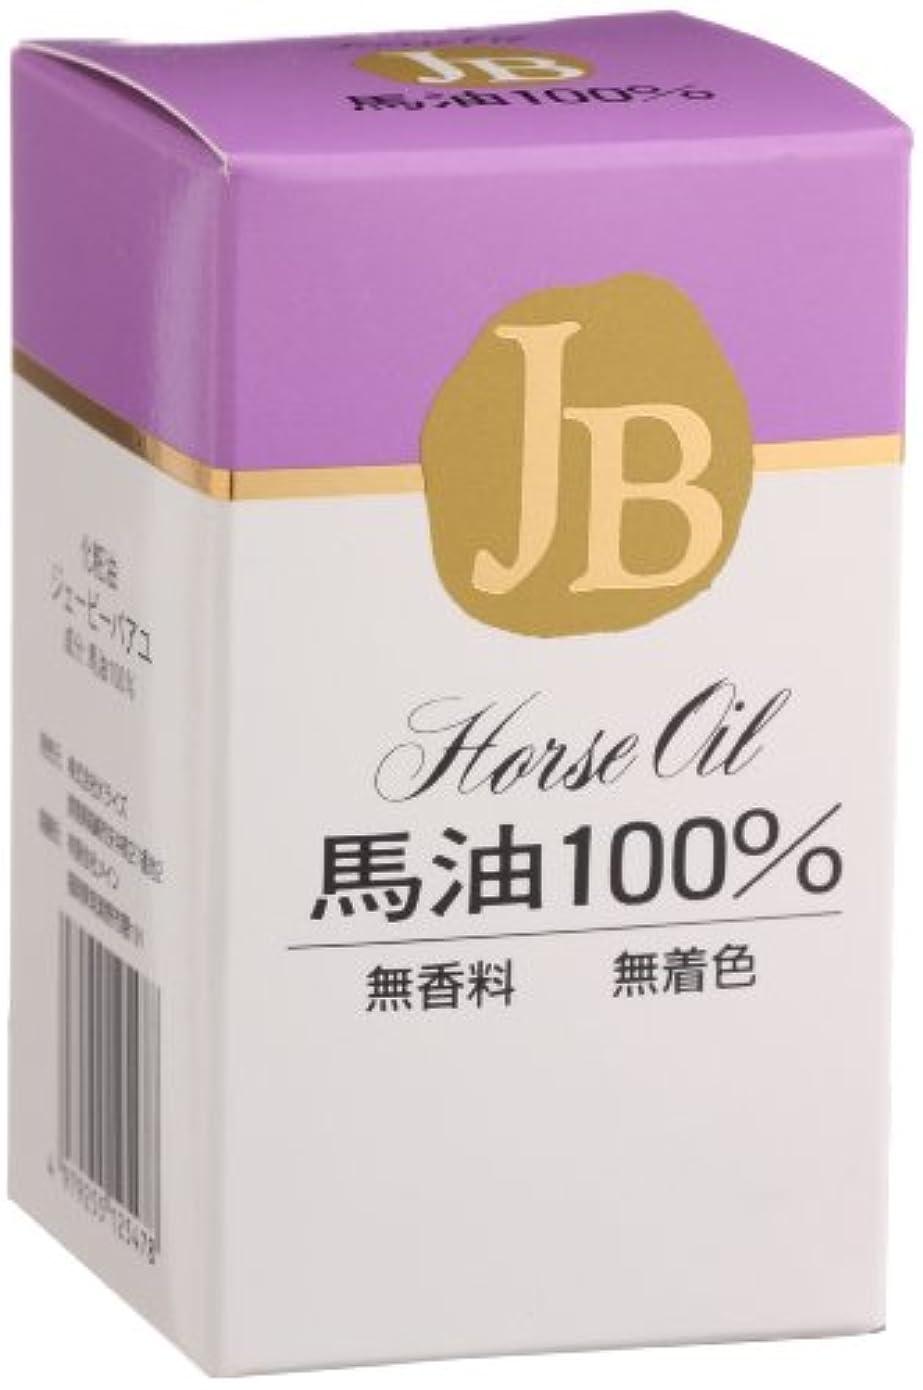 項目経由で士気JB馬油 100% 70ml